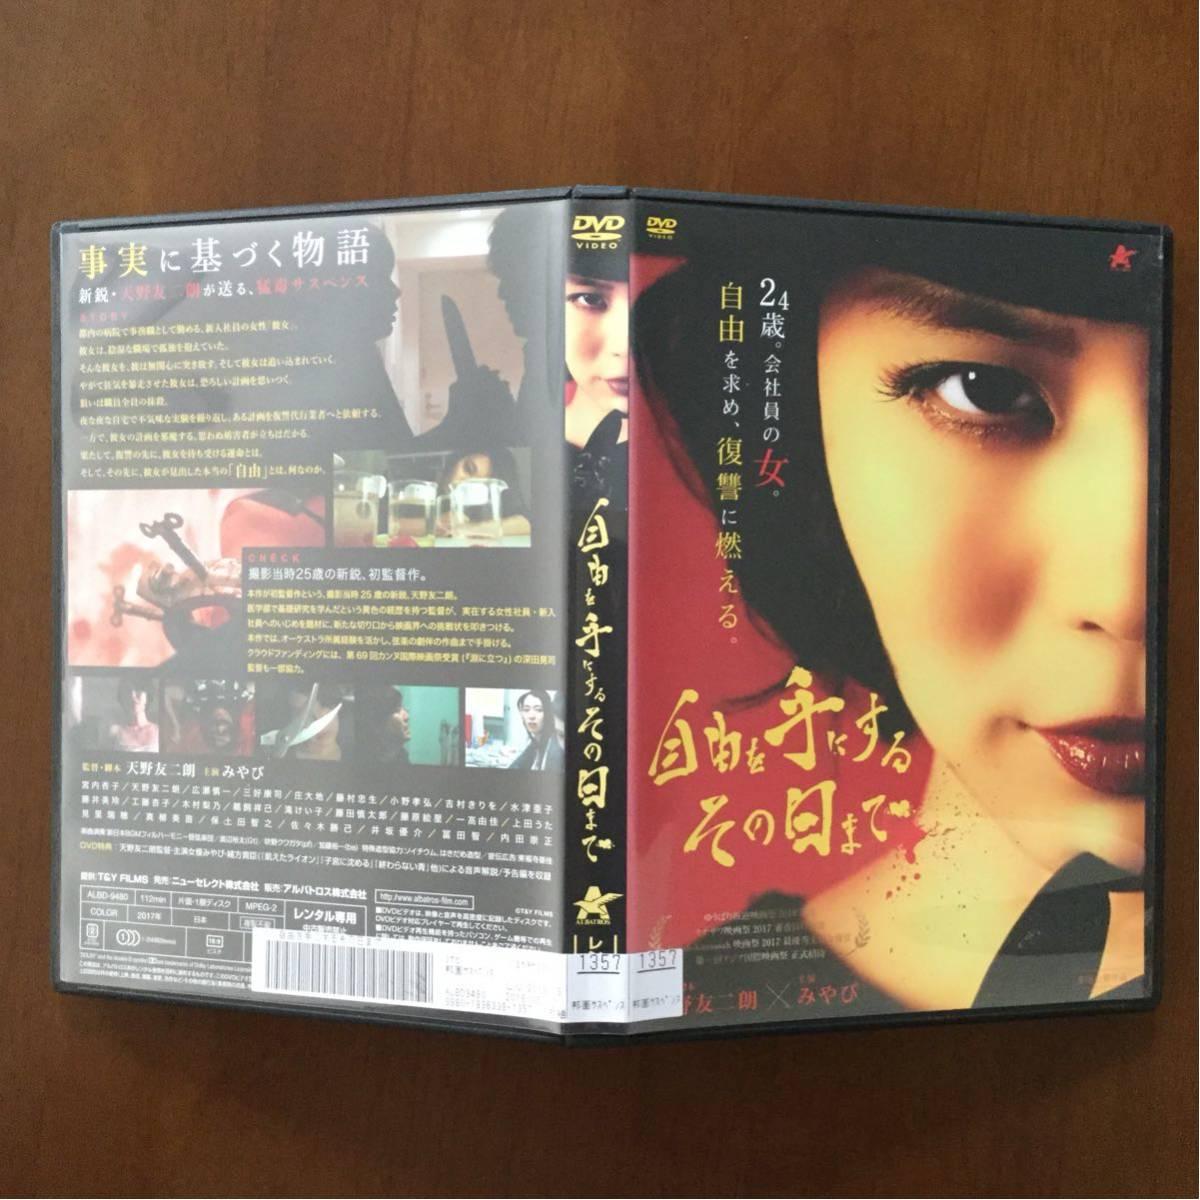 DVD 自由を手にするその日まで みやび 新品ケース交換  視聴確認済み_画像2